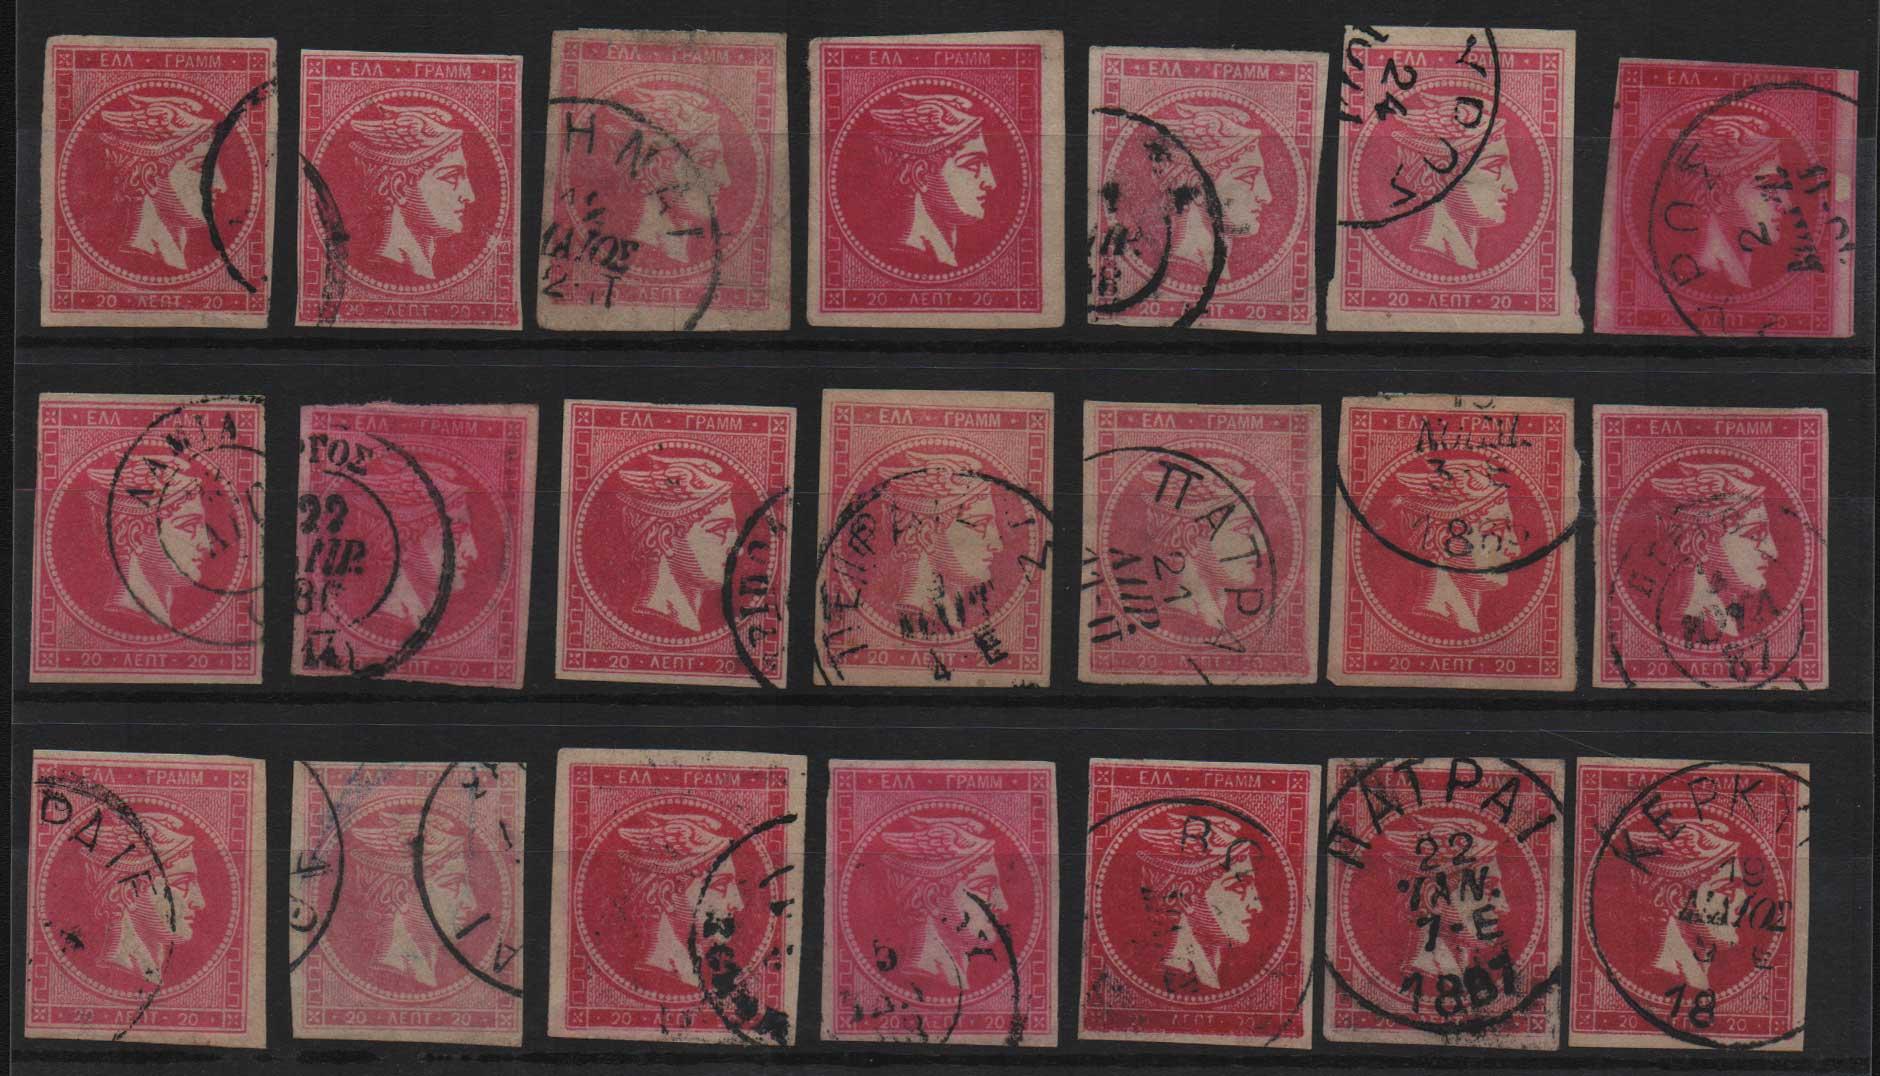 Lot 18 - -  LARGE HERMES HEAD large hermes head -  Athens Auctions Public Auction 70 General Stamp Sale